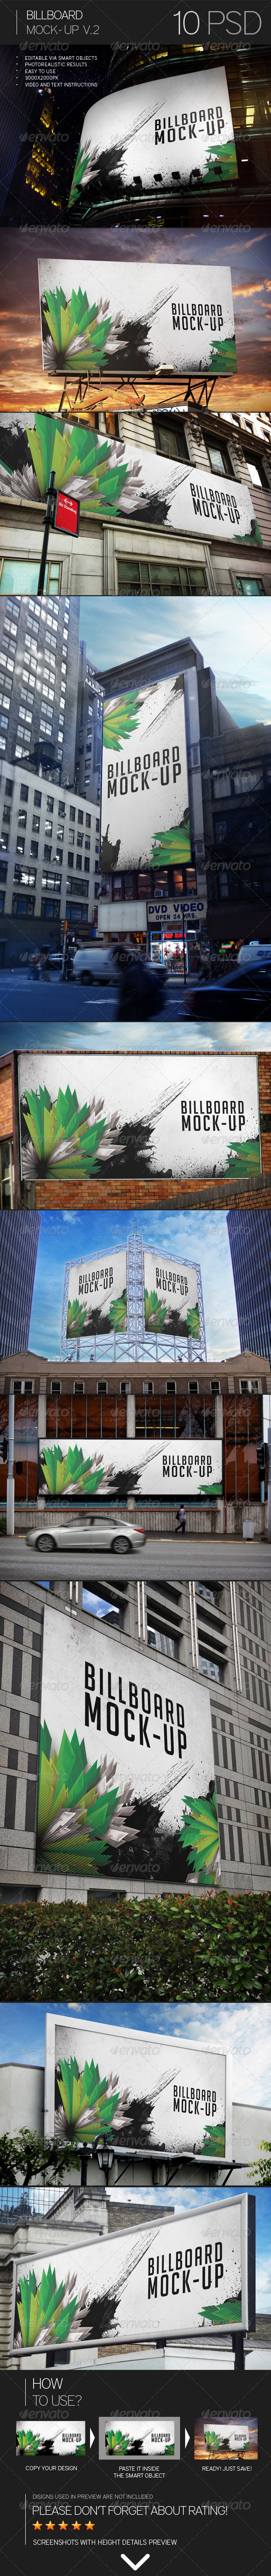 Billboard Mock-Up Vol.2 - Miscellaneous Print